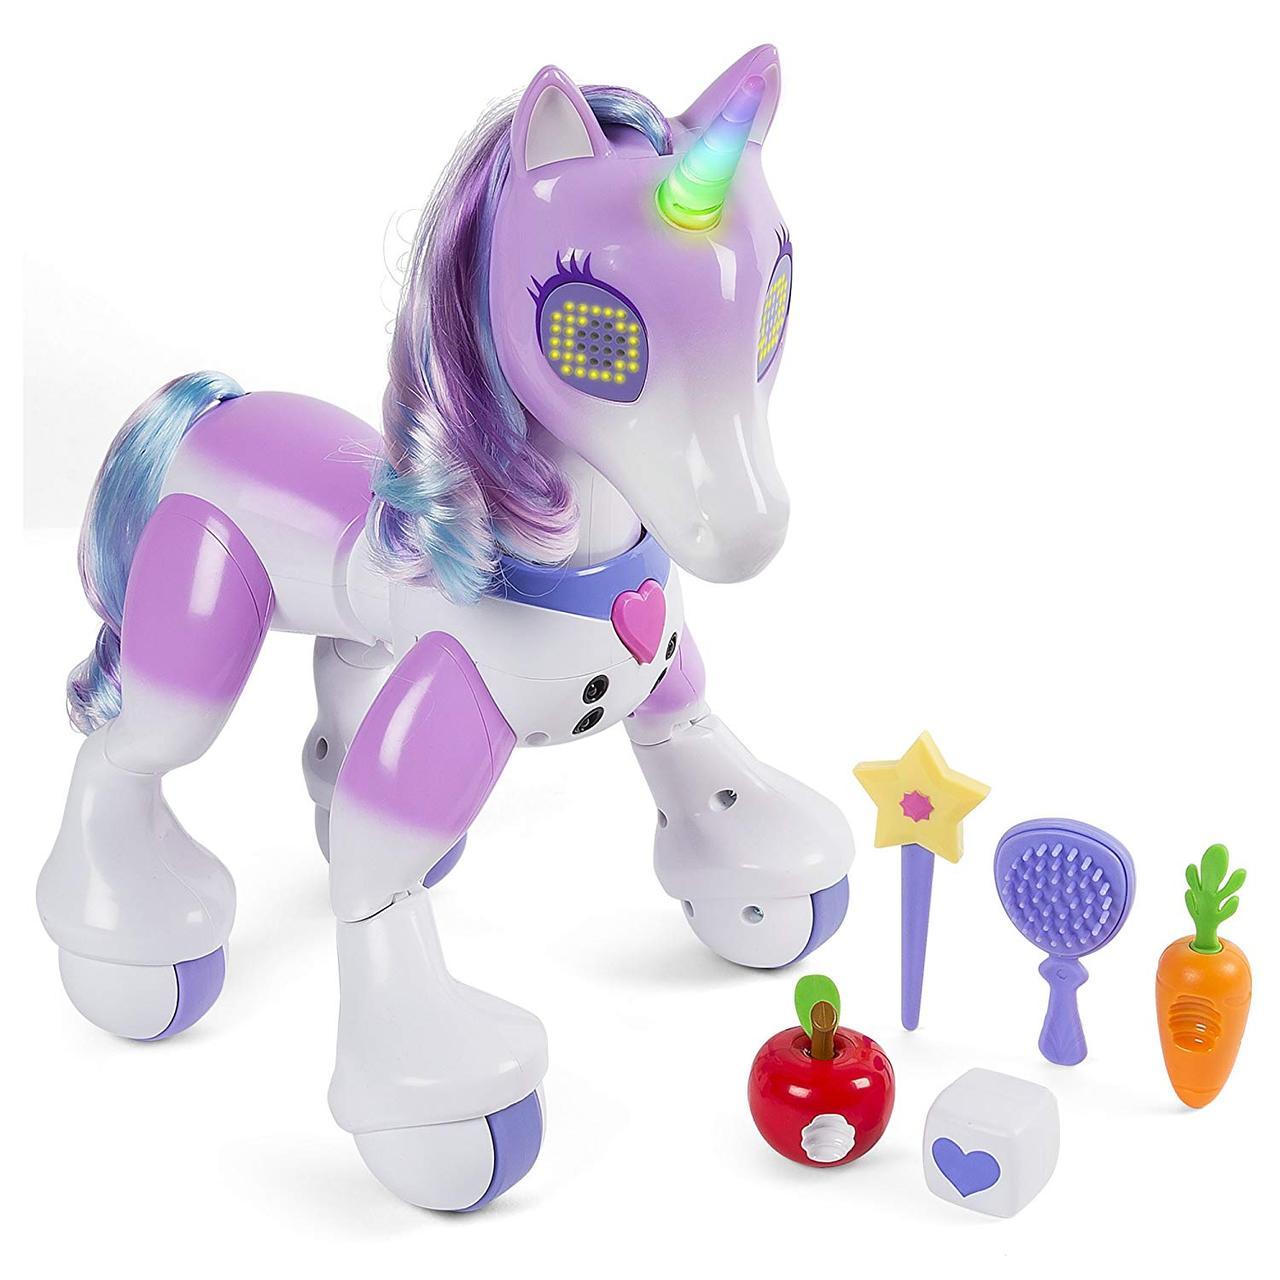 Интерактивный волшебный единорог Zoomer Enchanted Unicorn Exclusive Toy